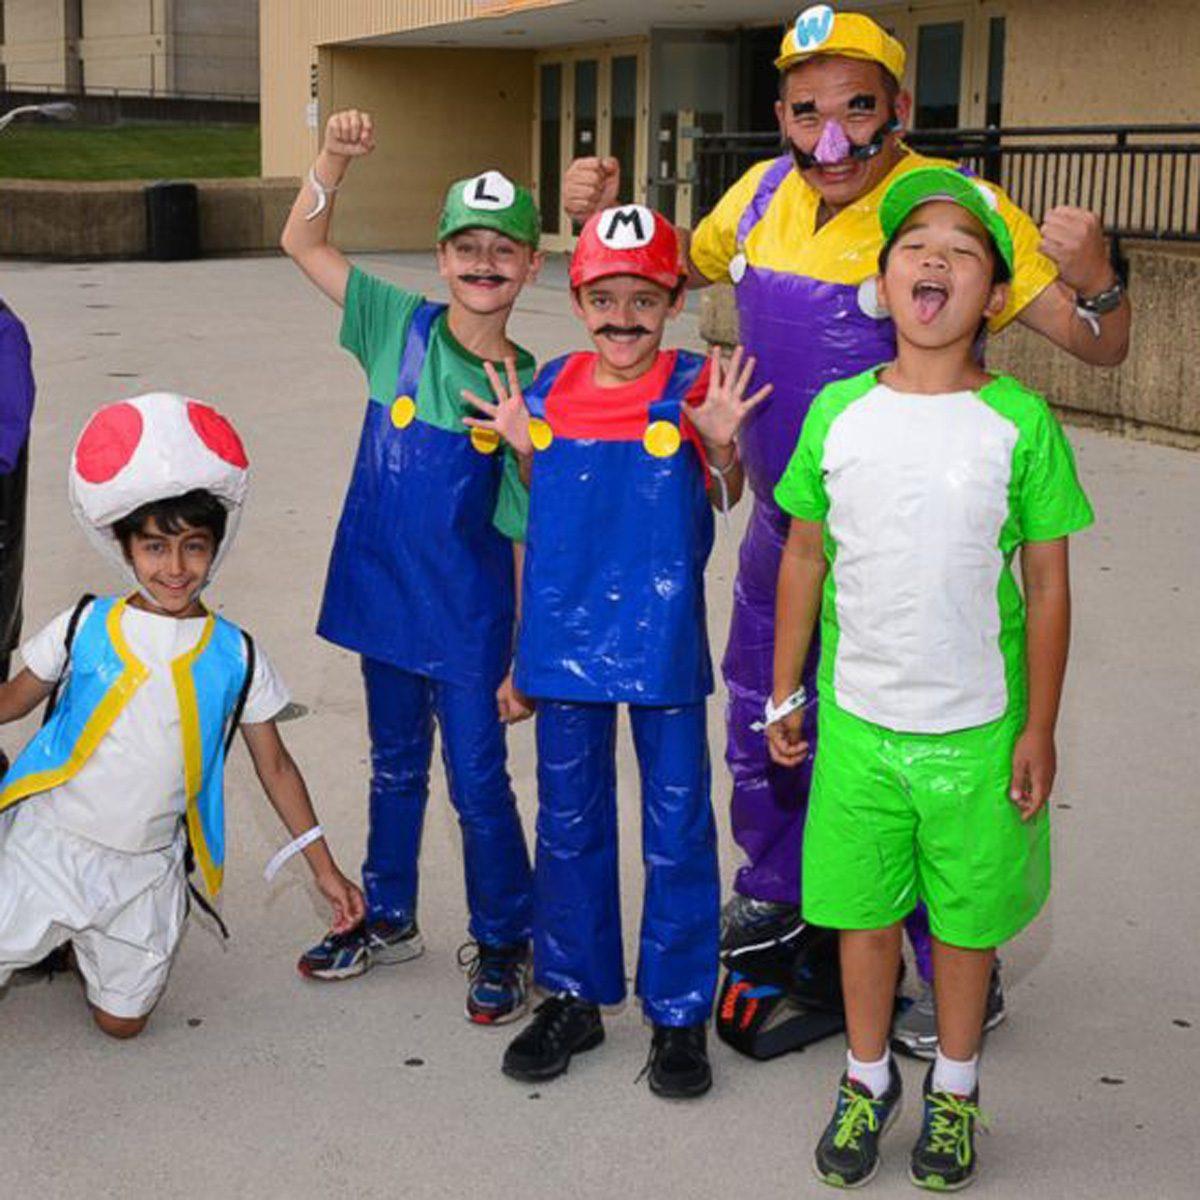 Yoshi Halloween Costume Diy.15 Fantastic Diy Duct Tape Halloween Costumes Family Handyman